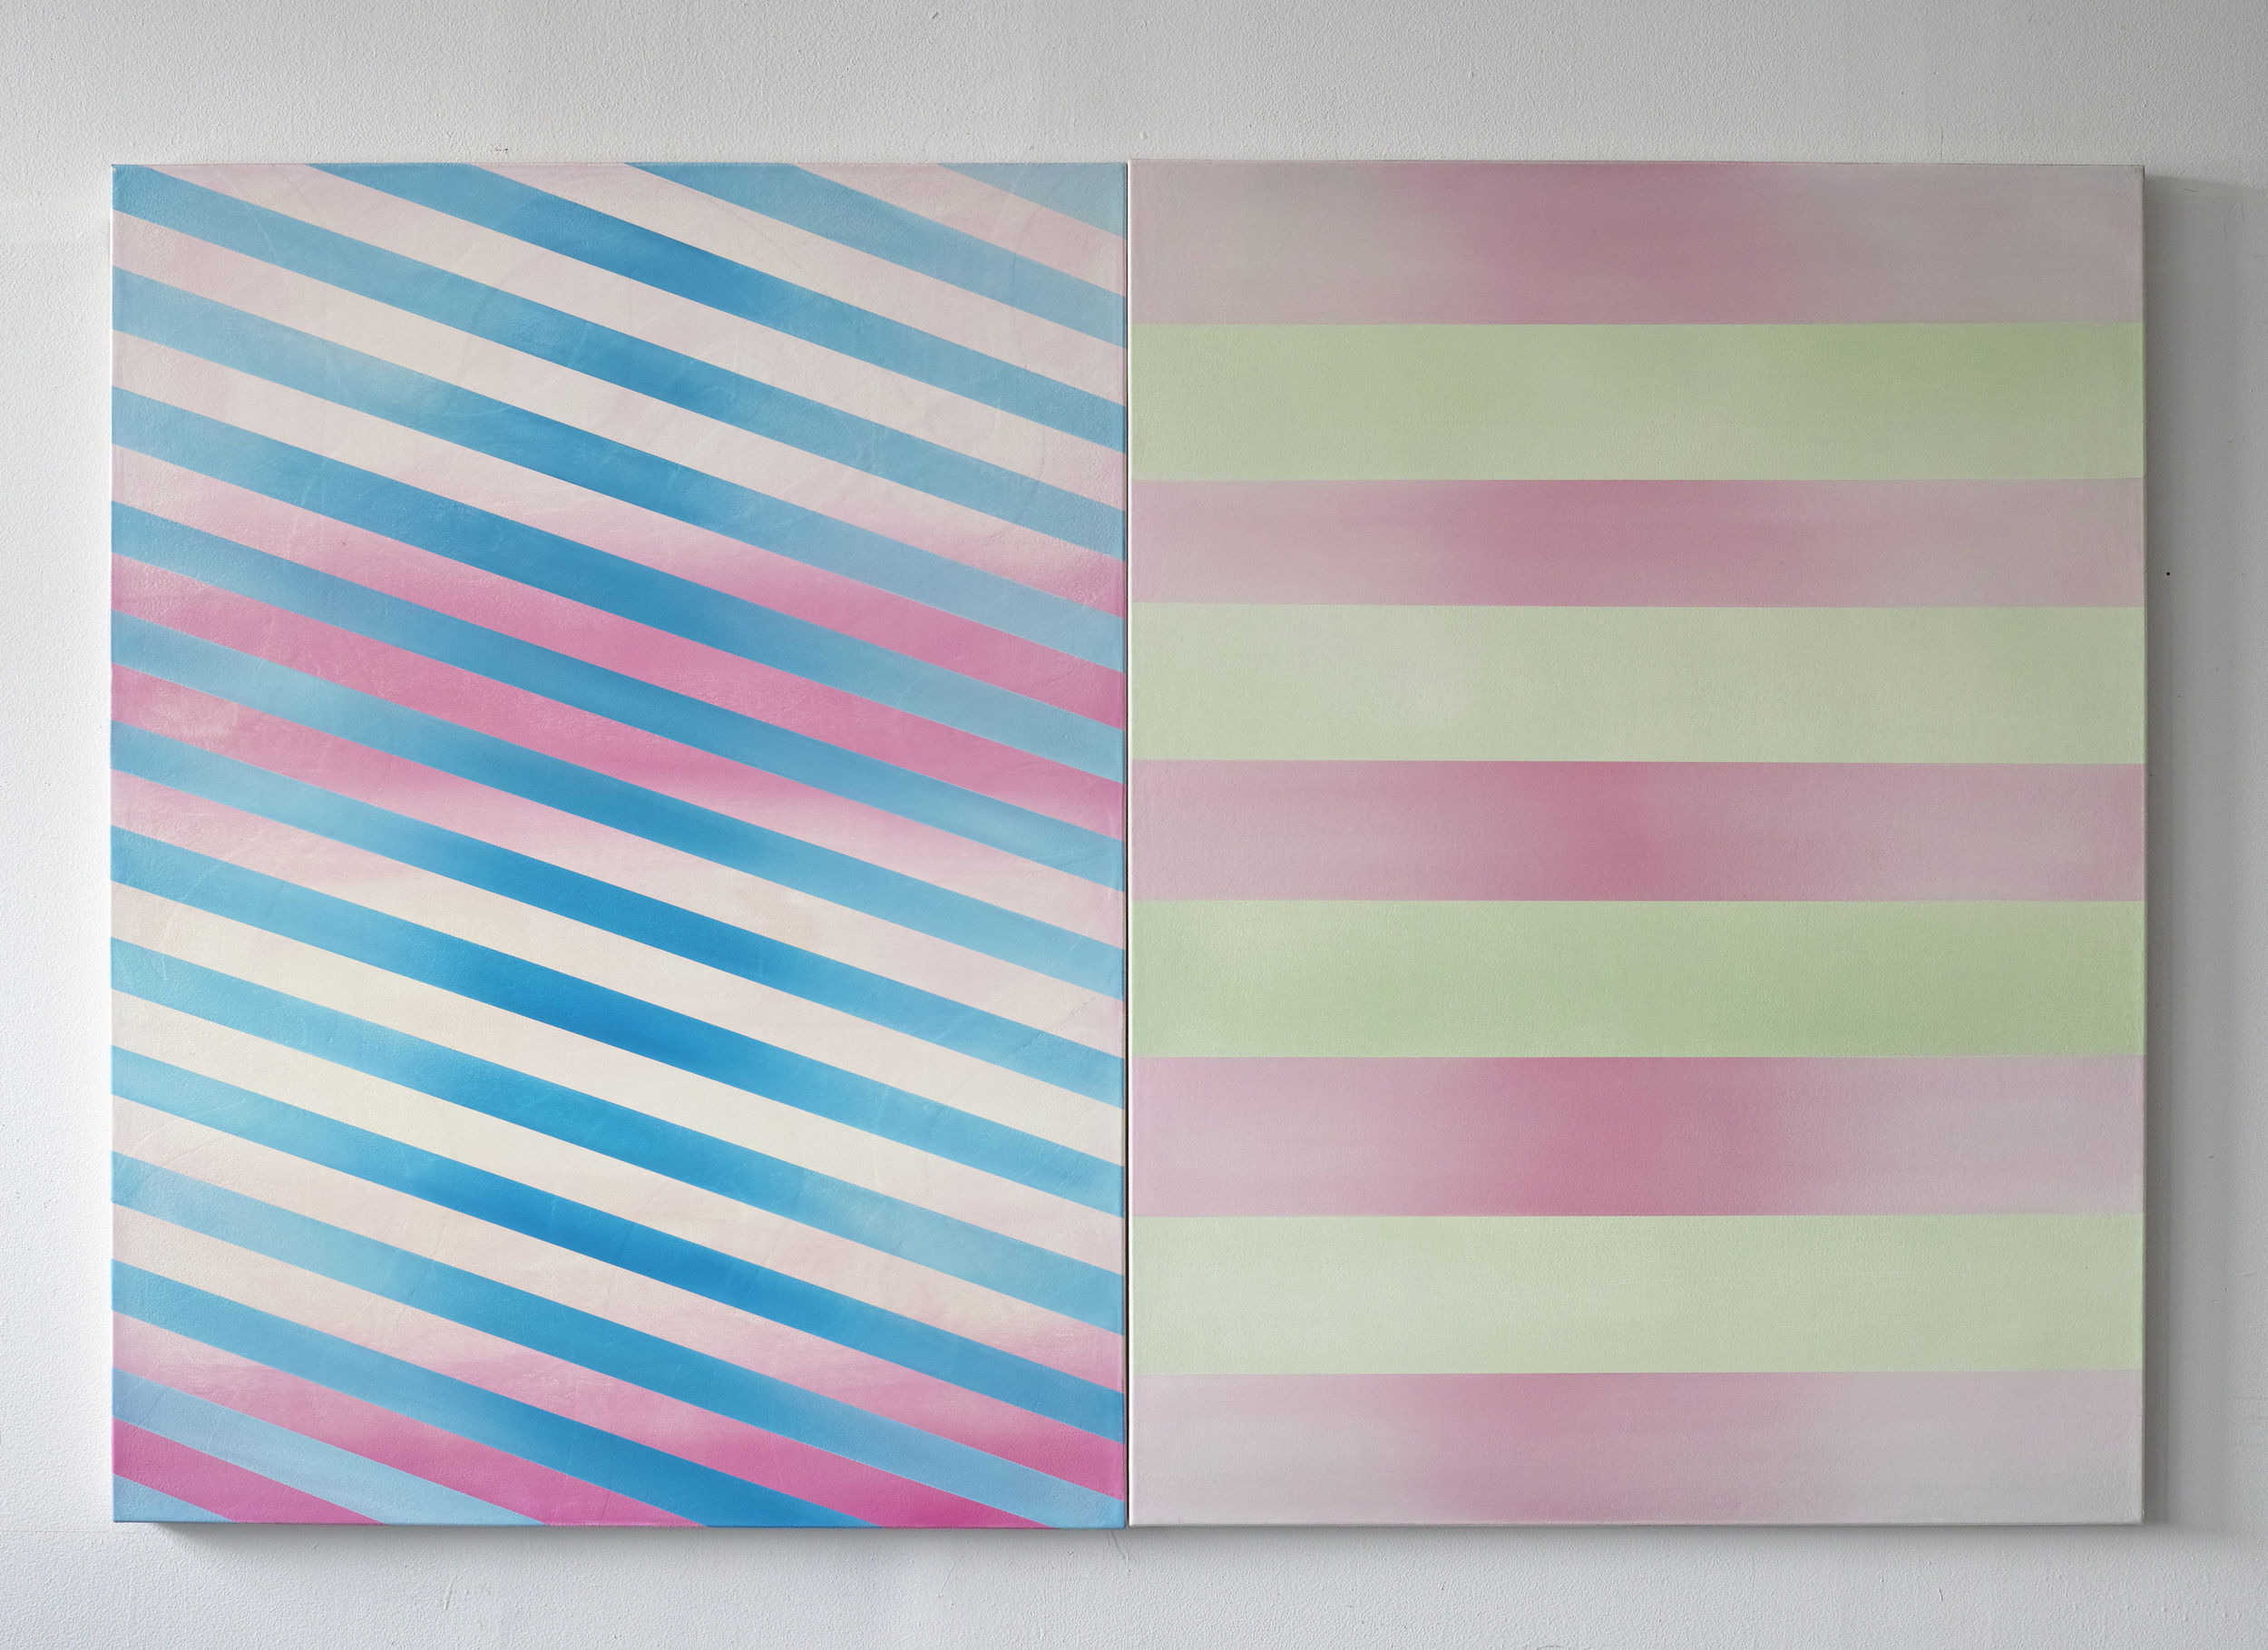 gregory c. brunet // #gradientforever // oil on canvas // 121.92 x 182.88cm // 2015